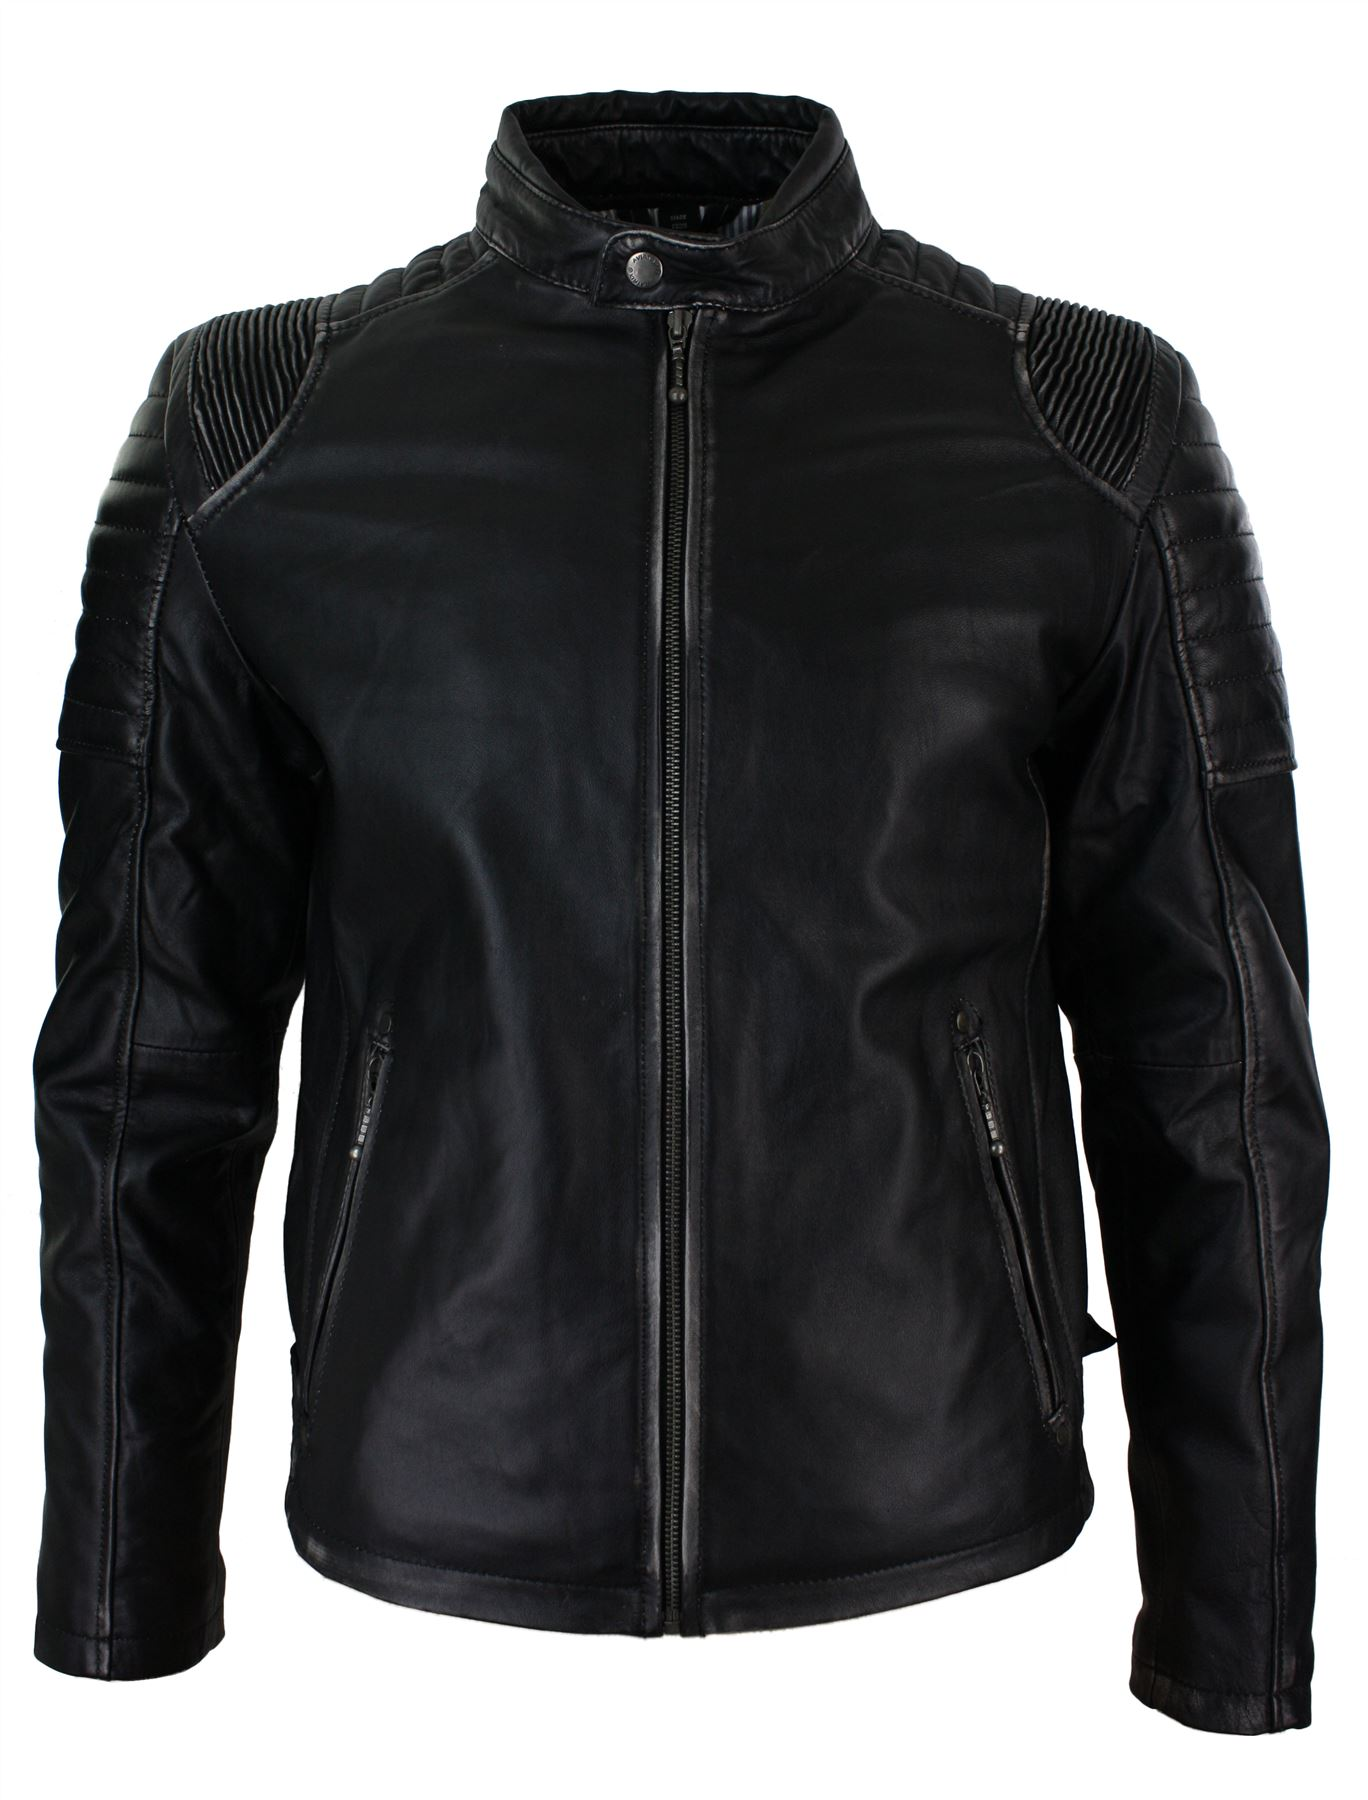 Mens black ruboff washed vintage effect leather jacket fitted biker style casual ebay - Laver une veste en cuir ...